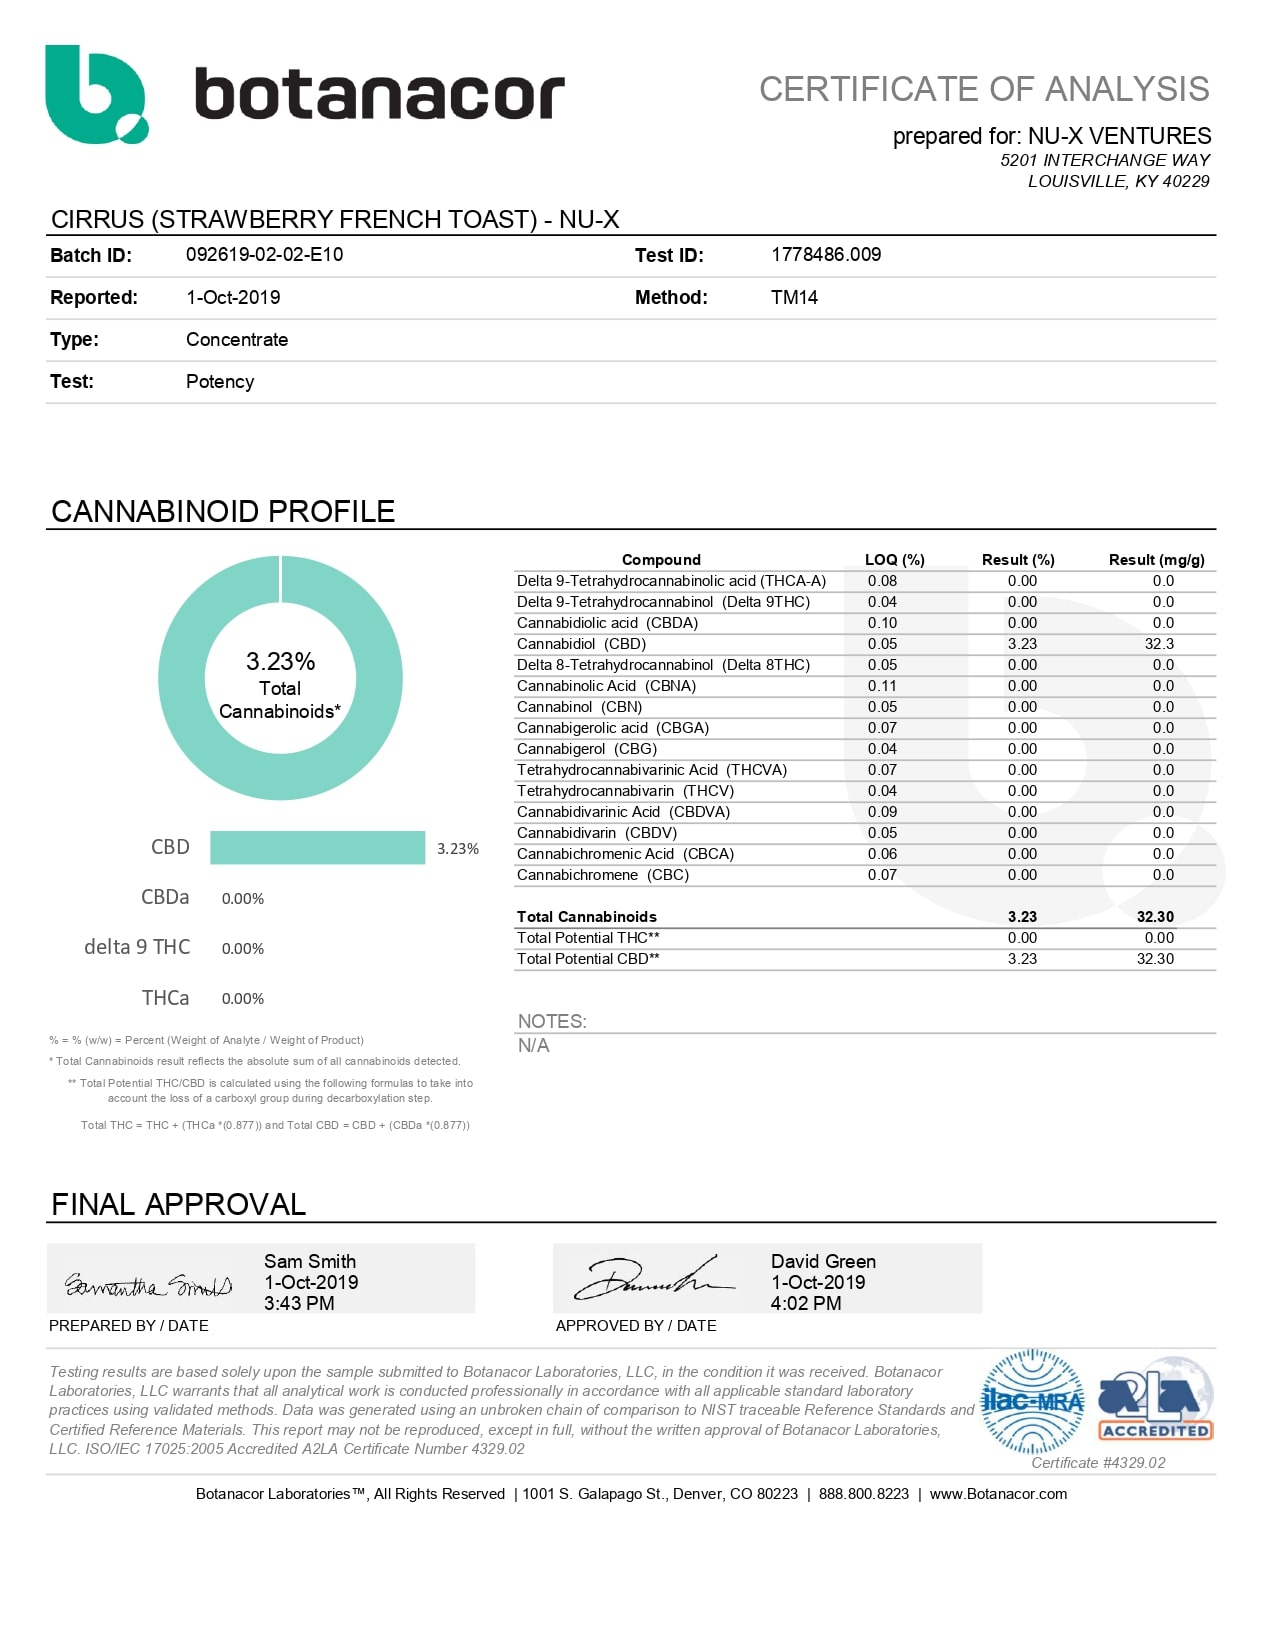 NU-X CBD eLiquid Strawberry French Toast - Cirrus Lab Report 1000mg